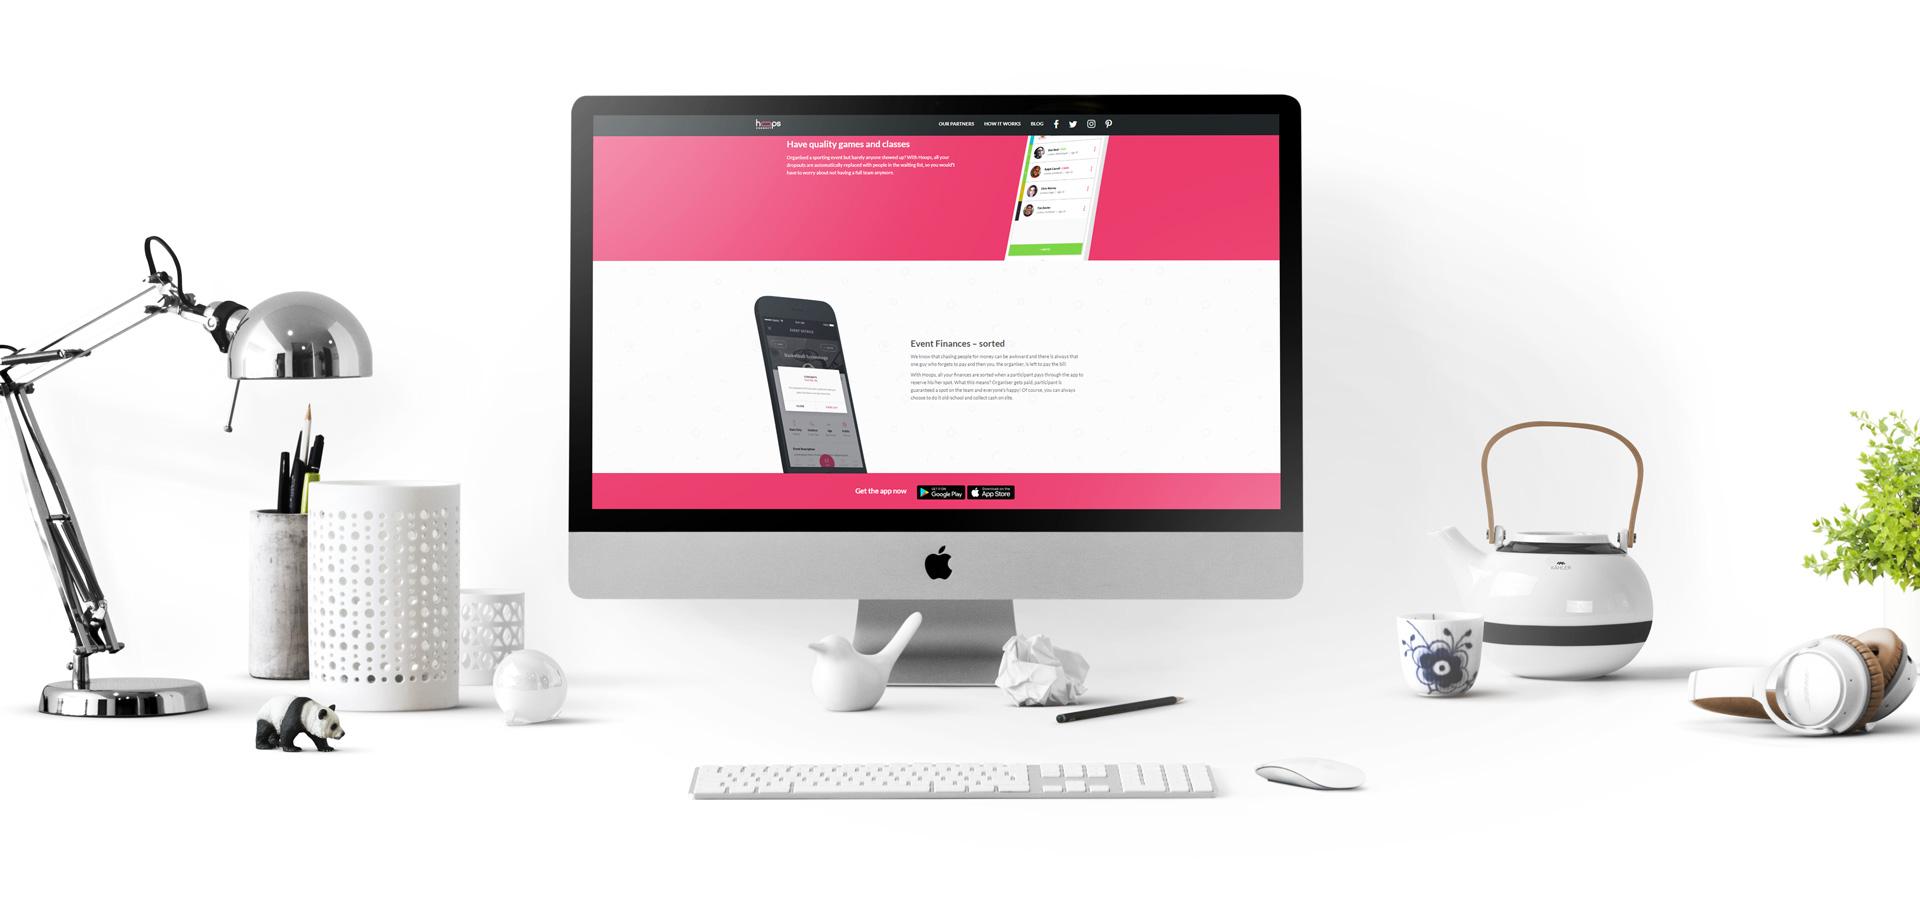 Hoops-Connect-wordpress-website-design-by-Orfi-Media